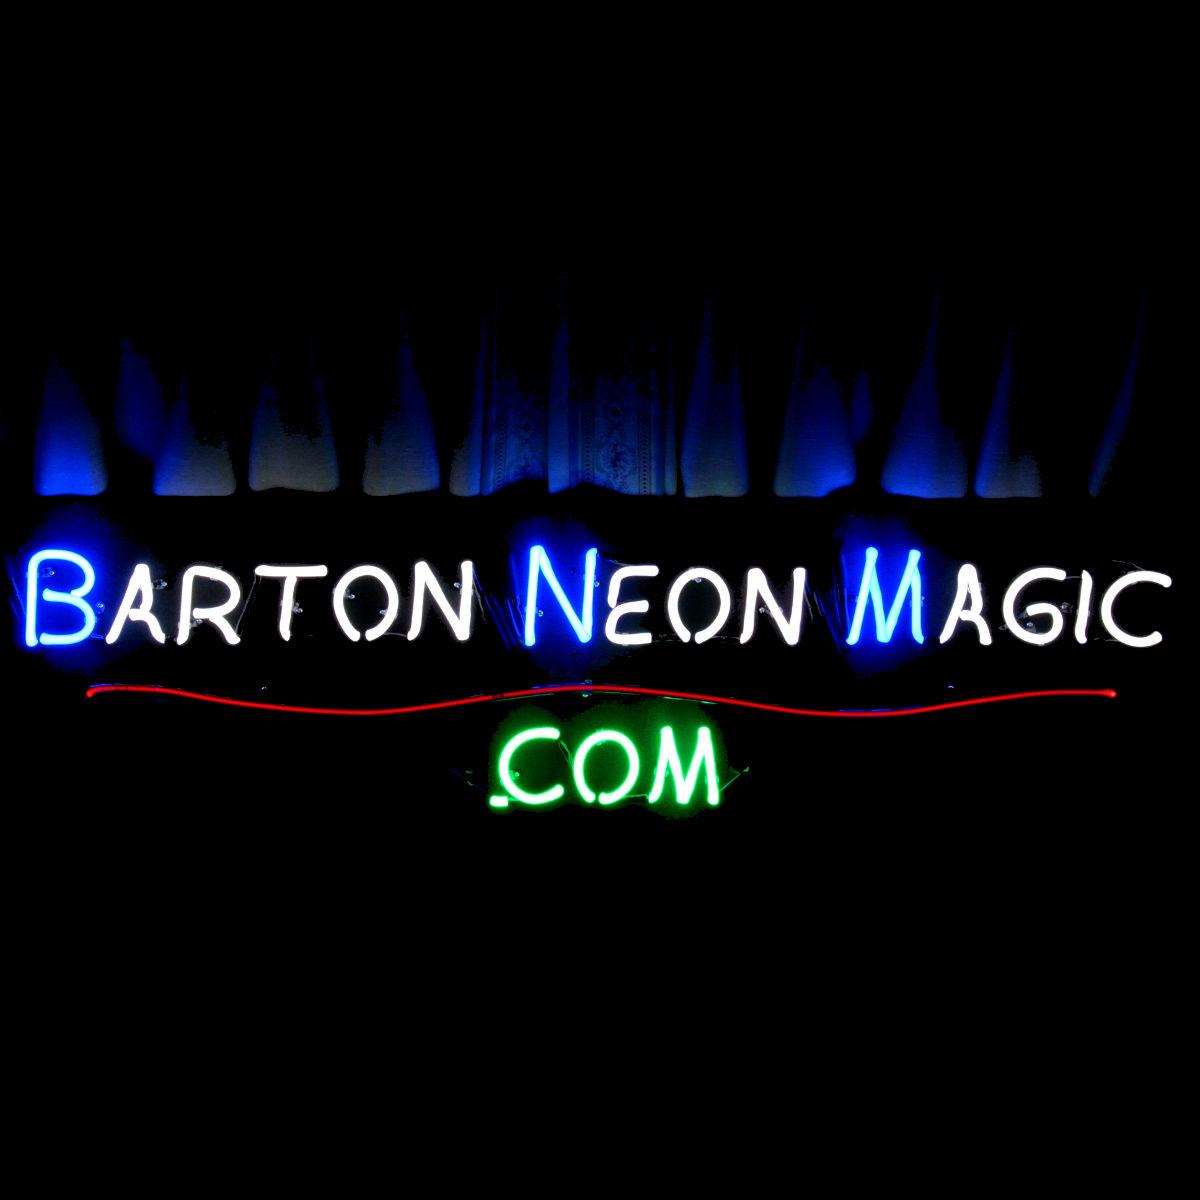 Fine Quality Custom Neon Lighting by John Barton - BartonNeonMagic.com